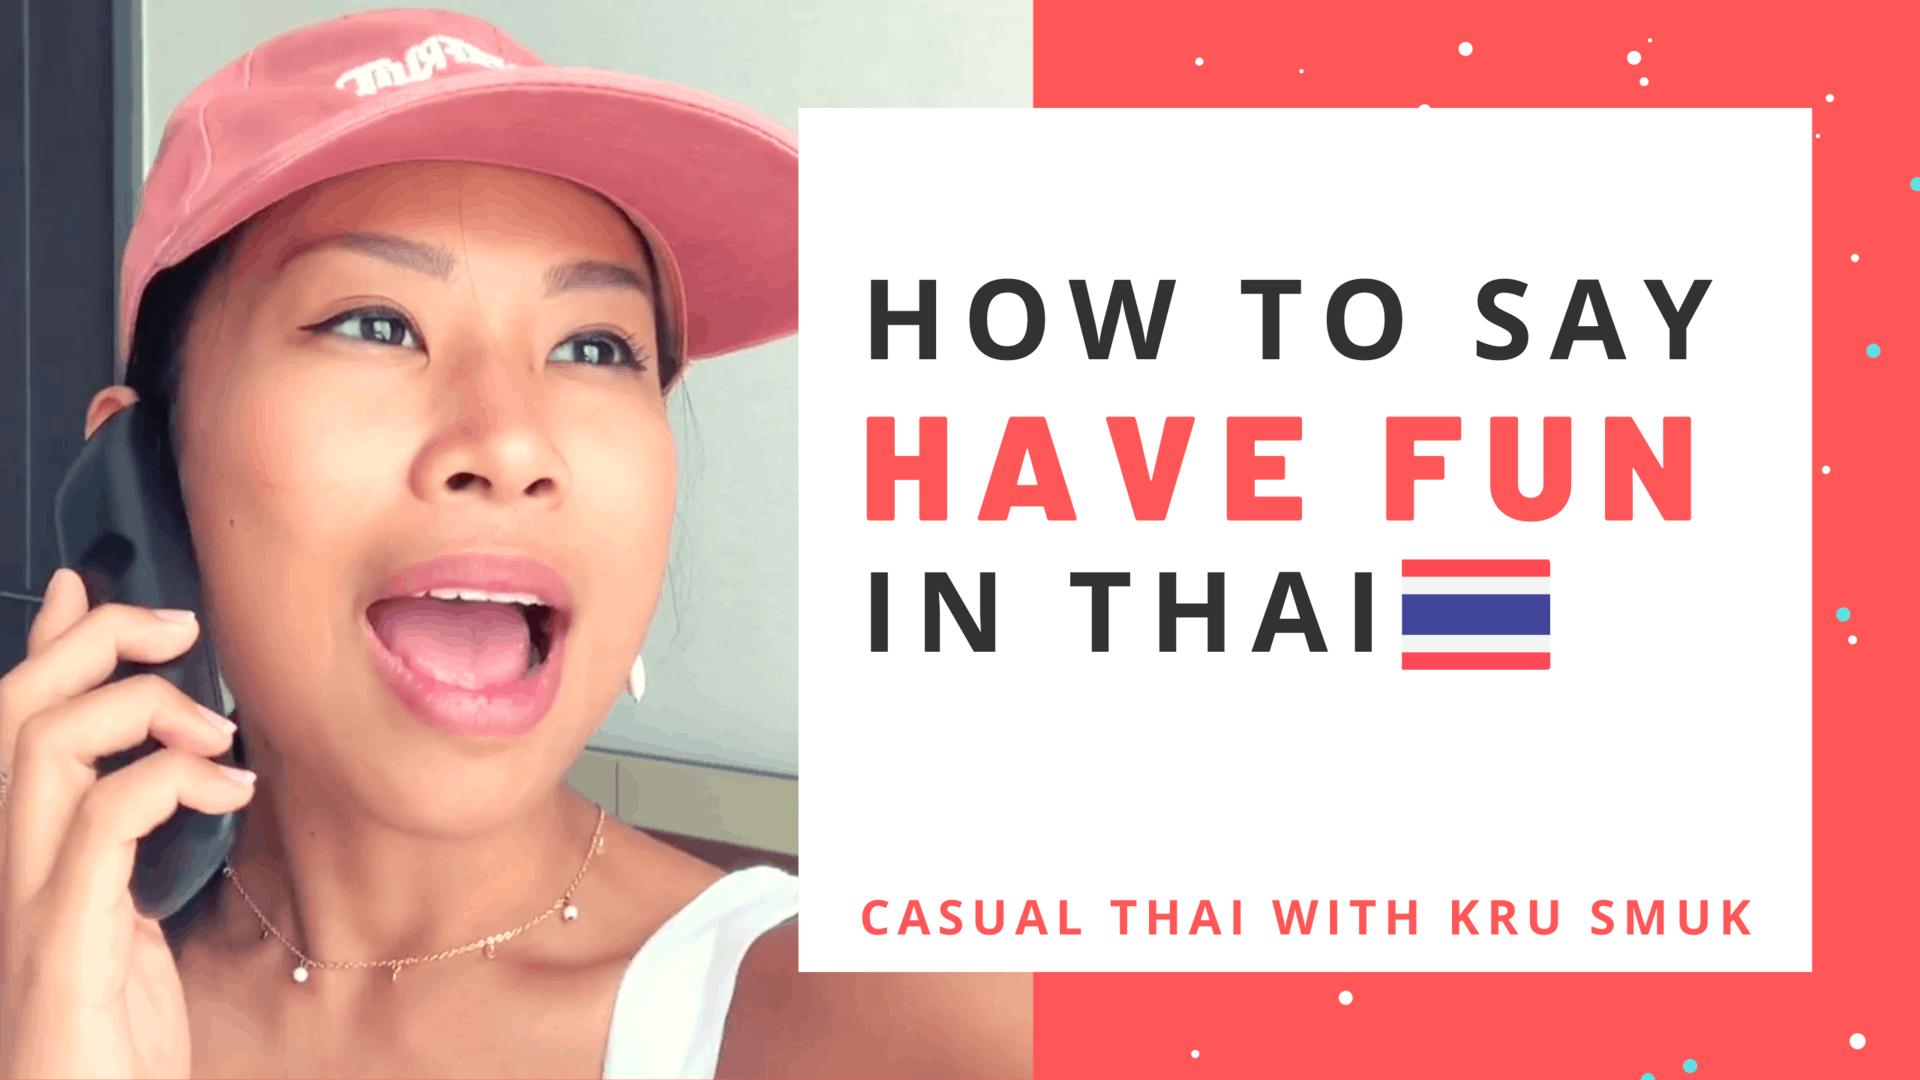 Have fun in Thai